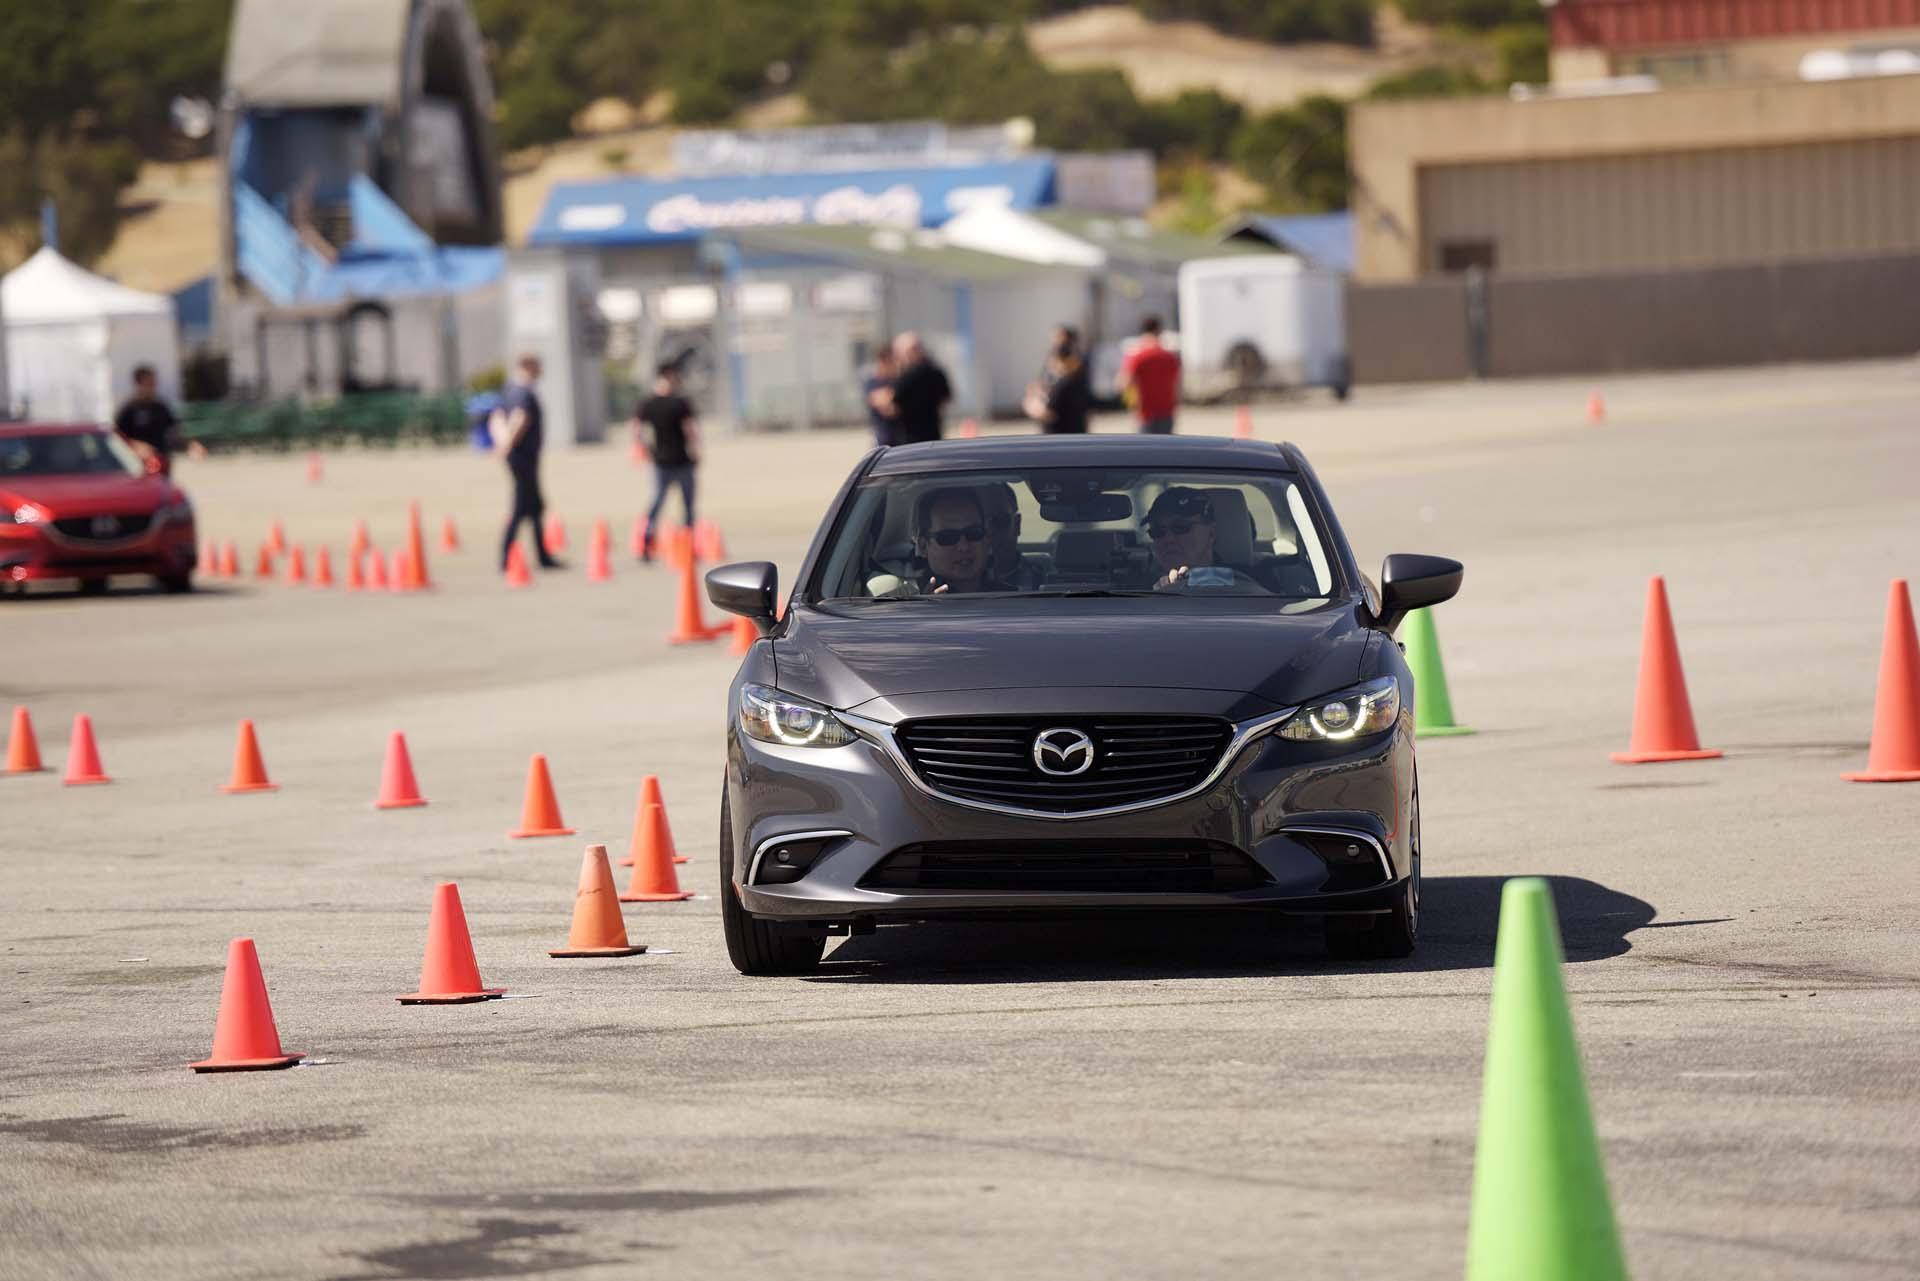 2016 Mazda SkyActive Driving Academy